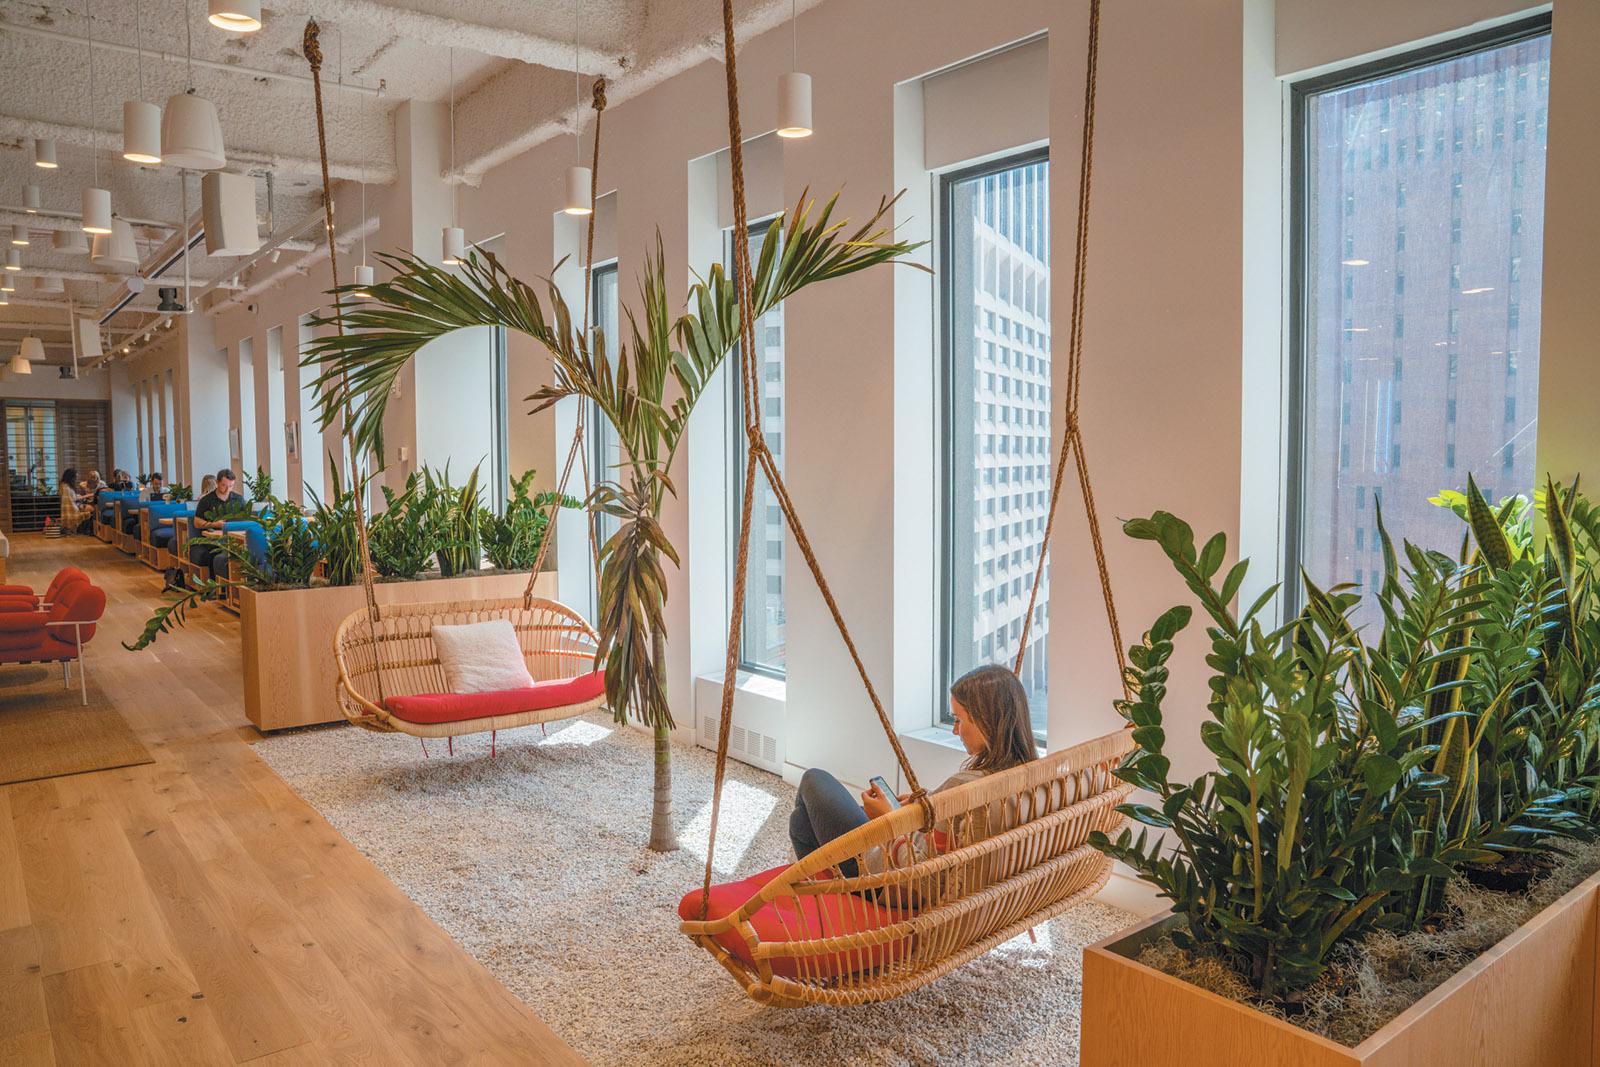 A WeWork office in lower Manhattan, 2019